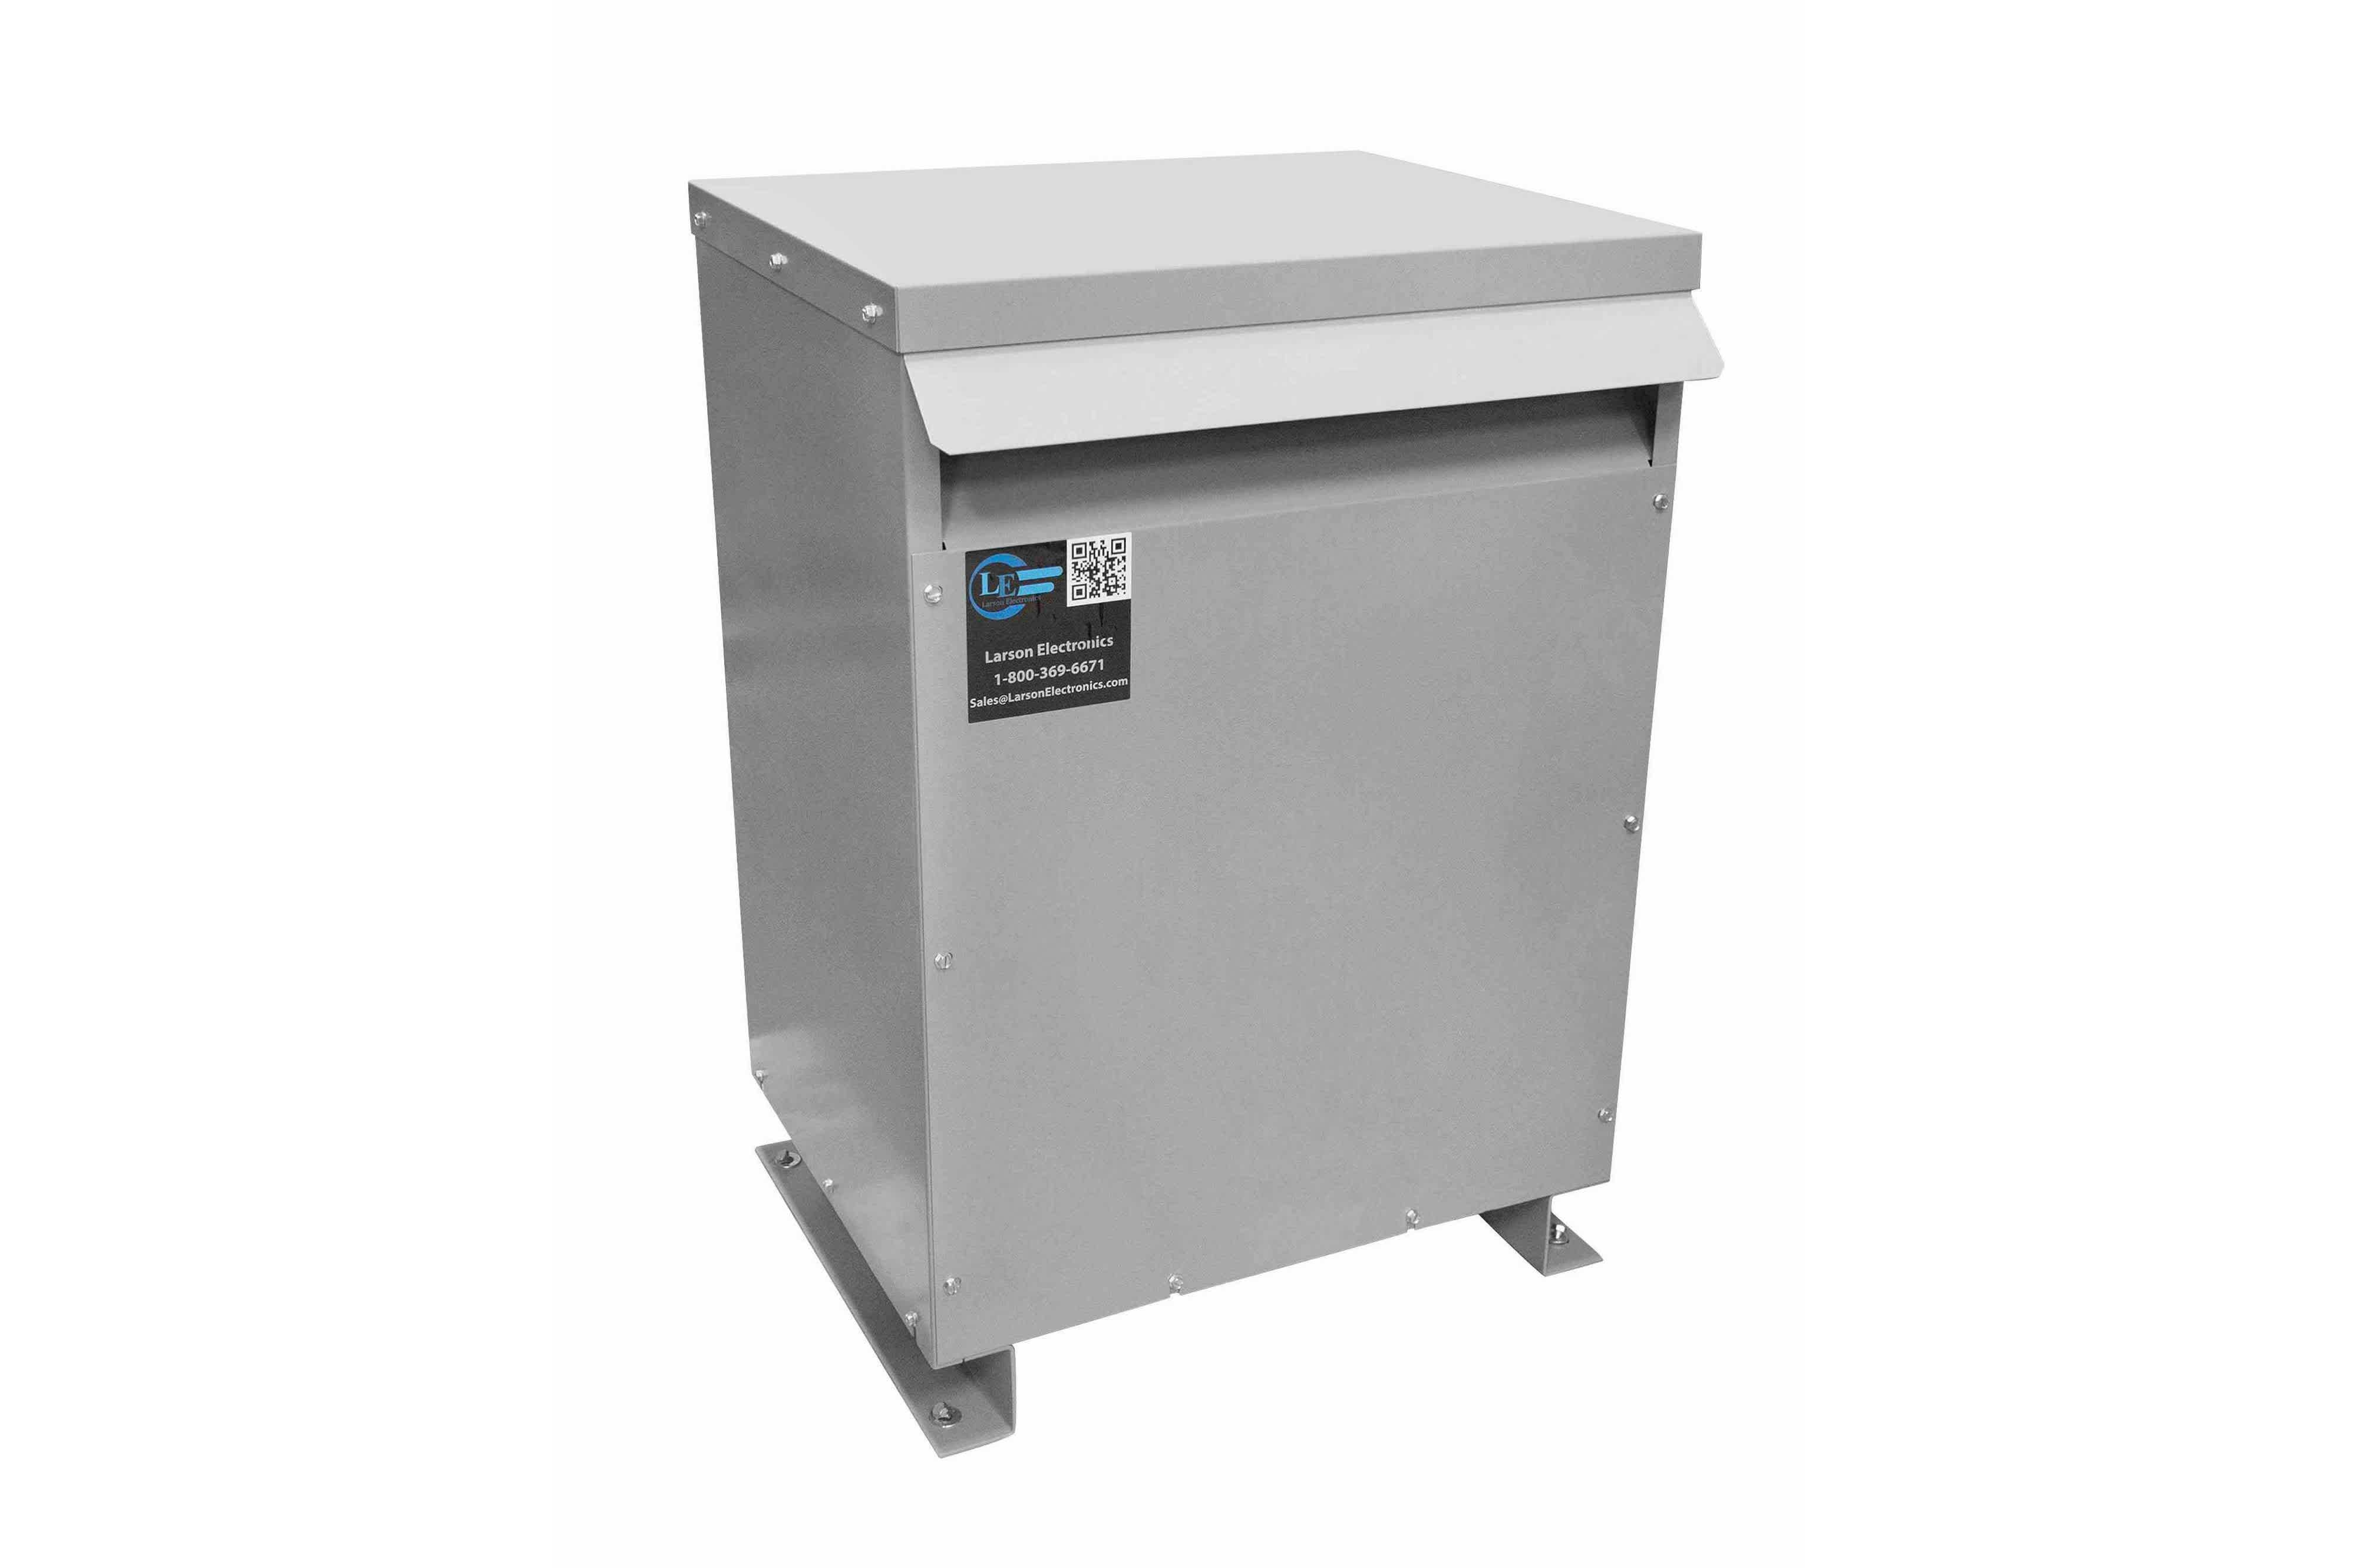 1000 kVA 3PH DOE Transformer, 575V Delta Primary, 415Y/240 Wye-N Secondary, N3R, Ventilated, 60 Hz